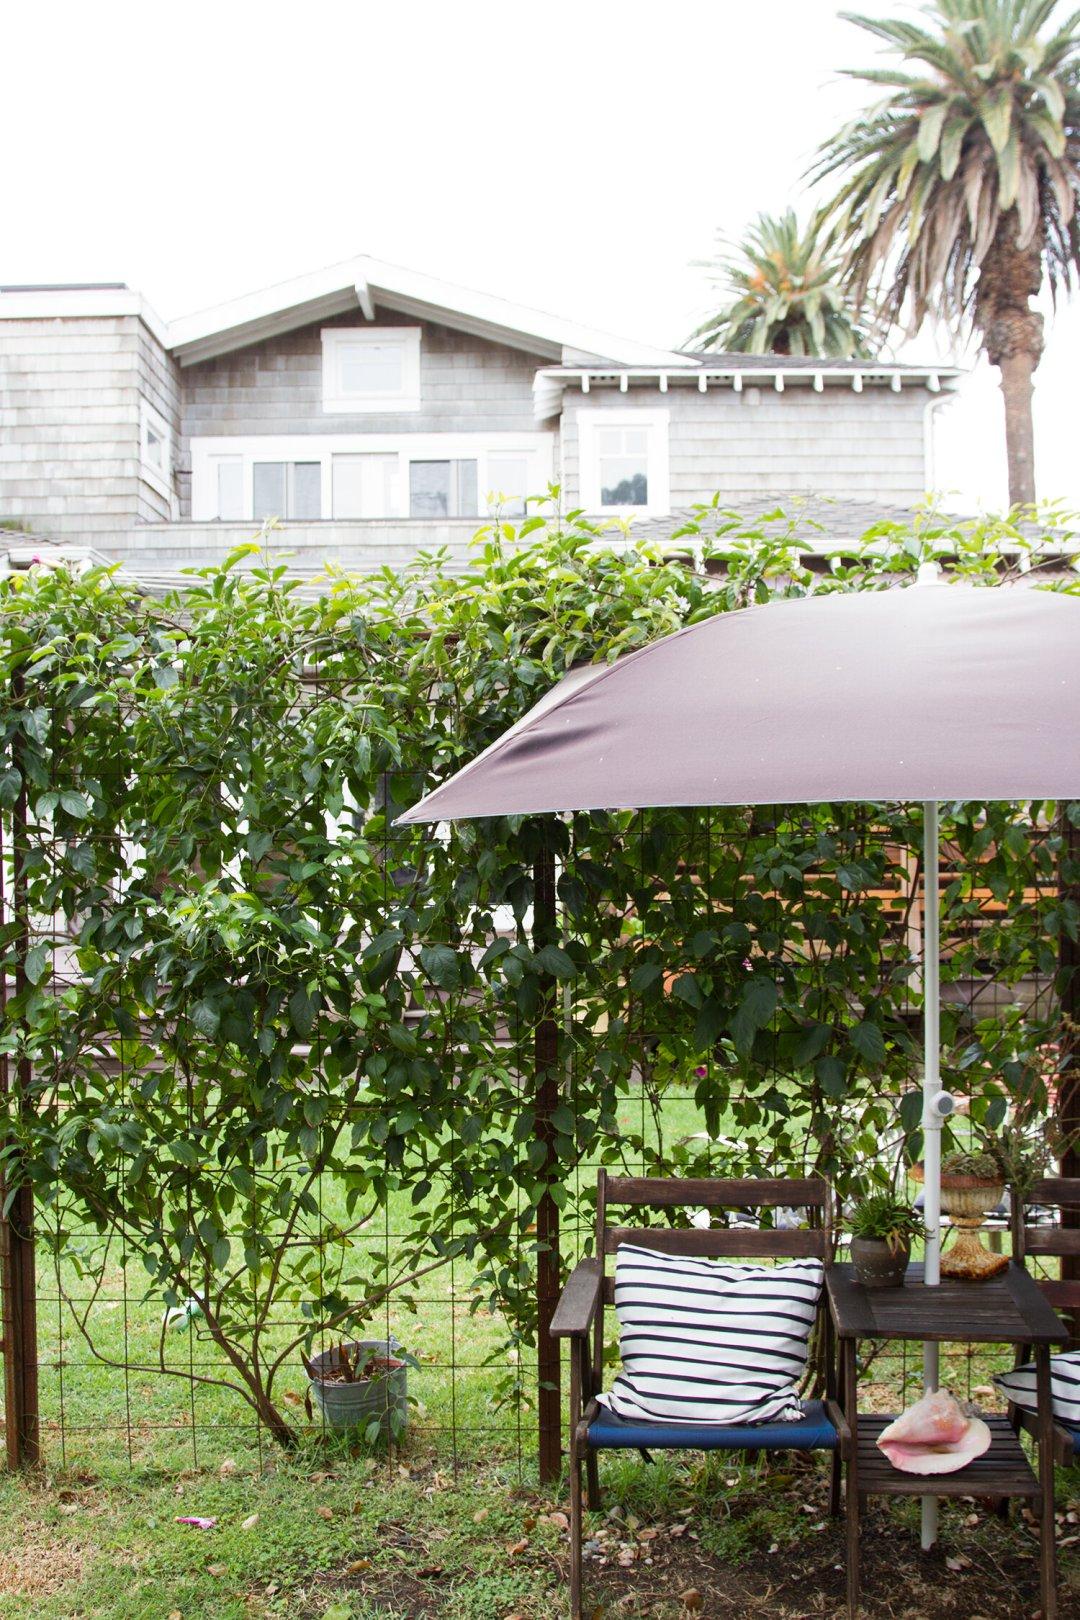 craftsman mini-me: venice, california | reading my tea leaves